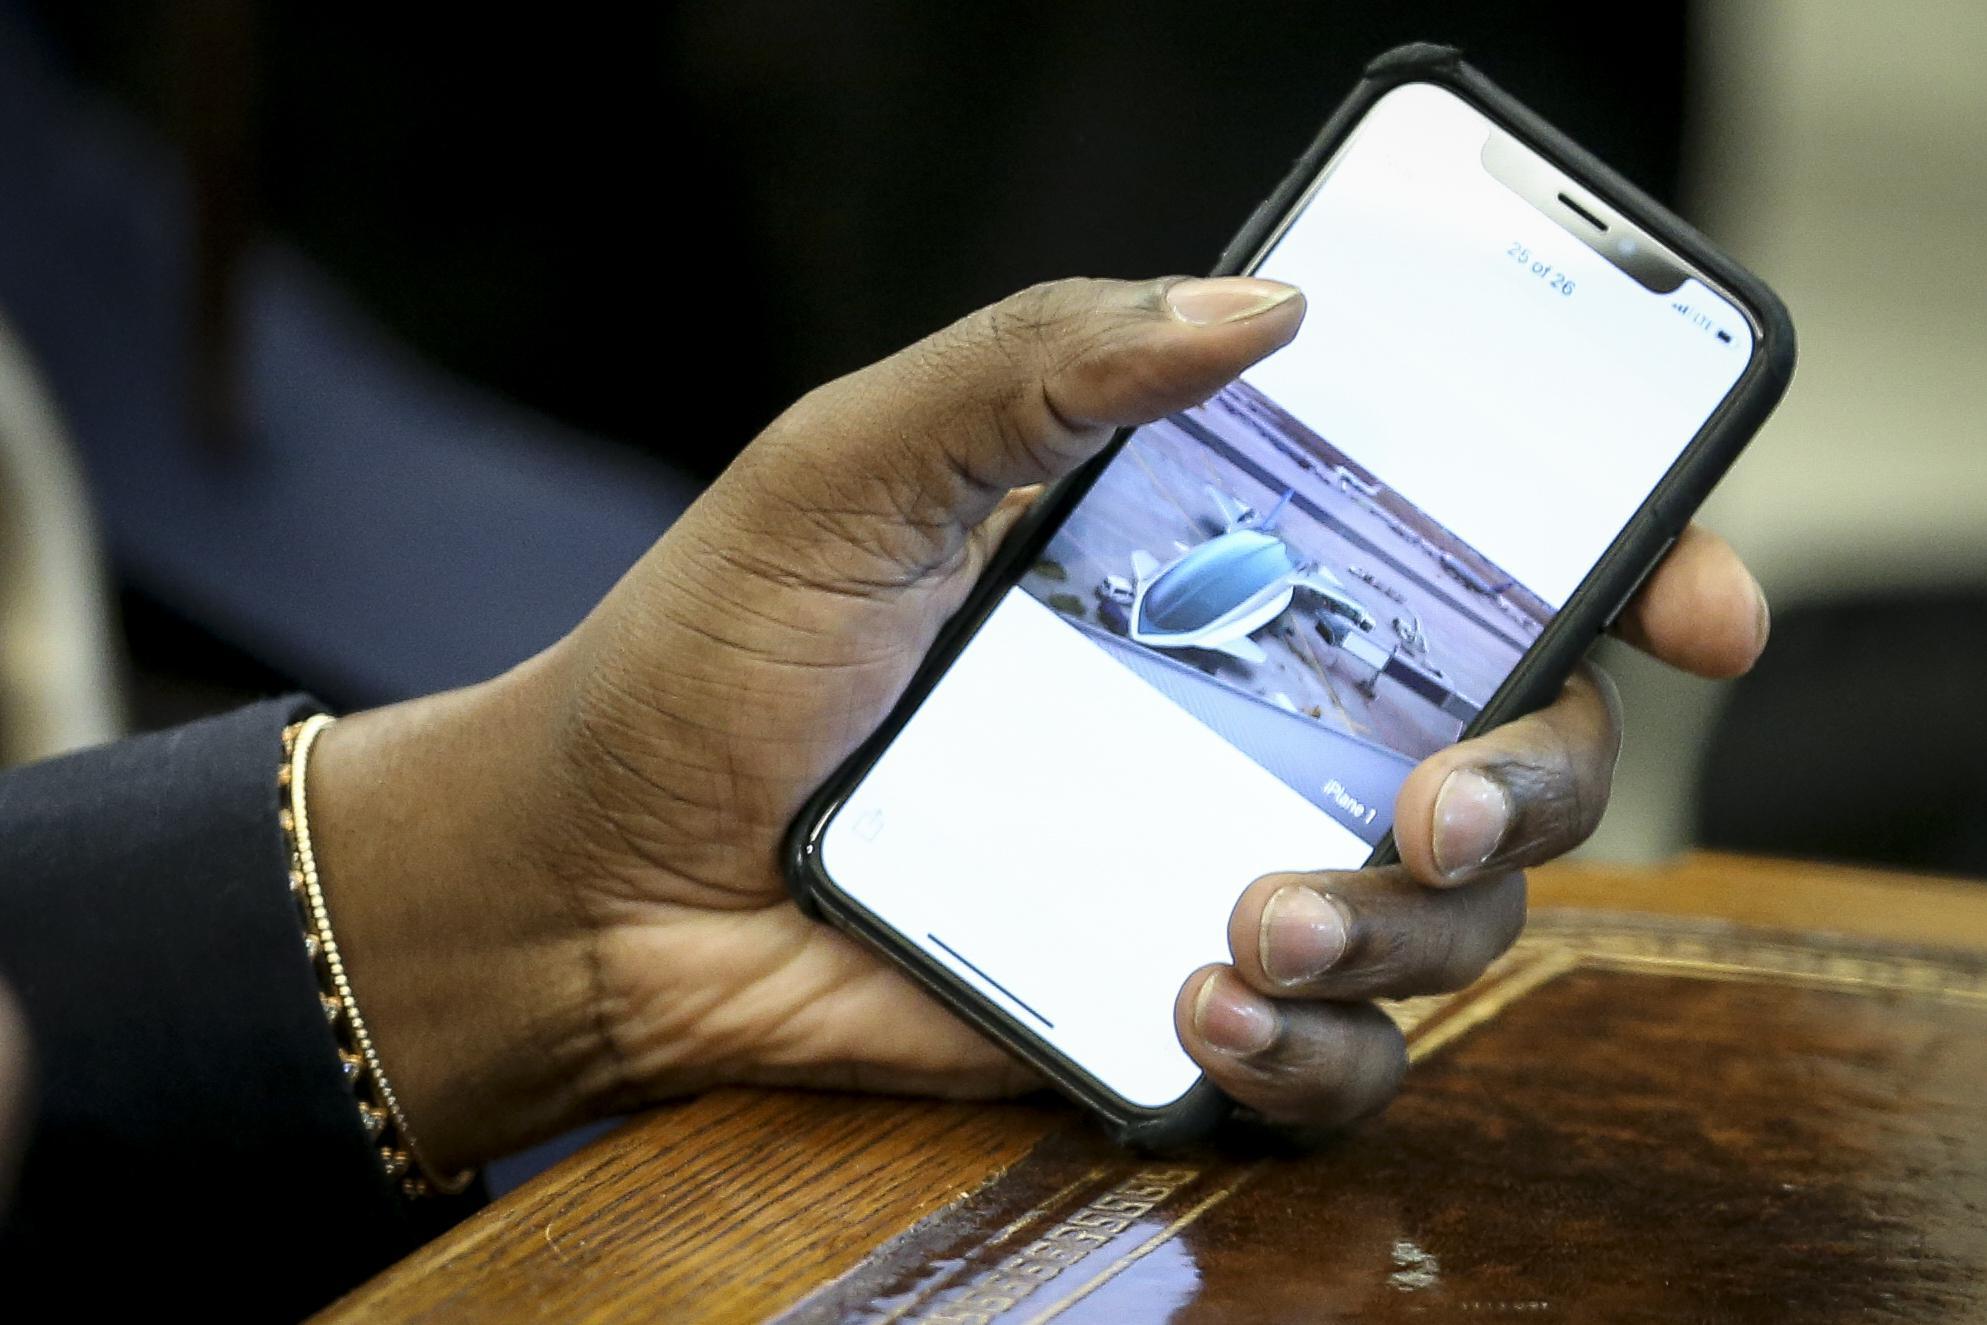 Kanye West's phone.